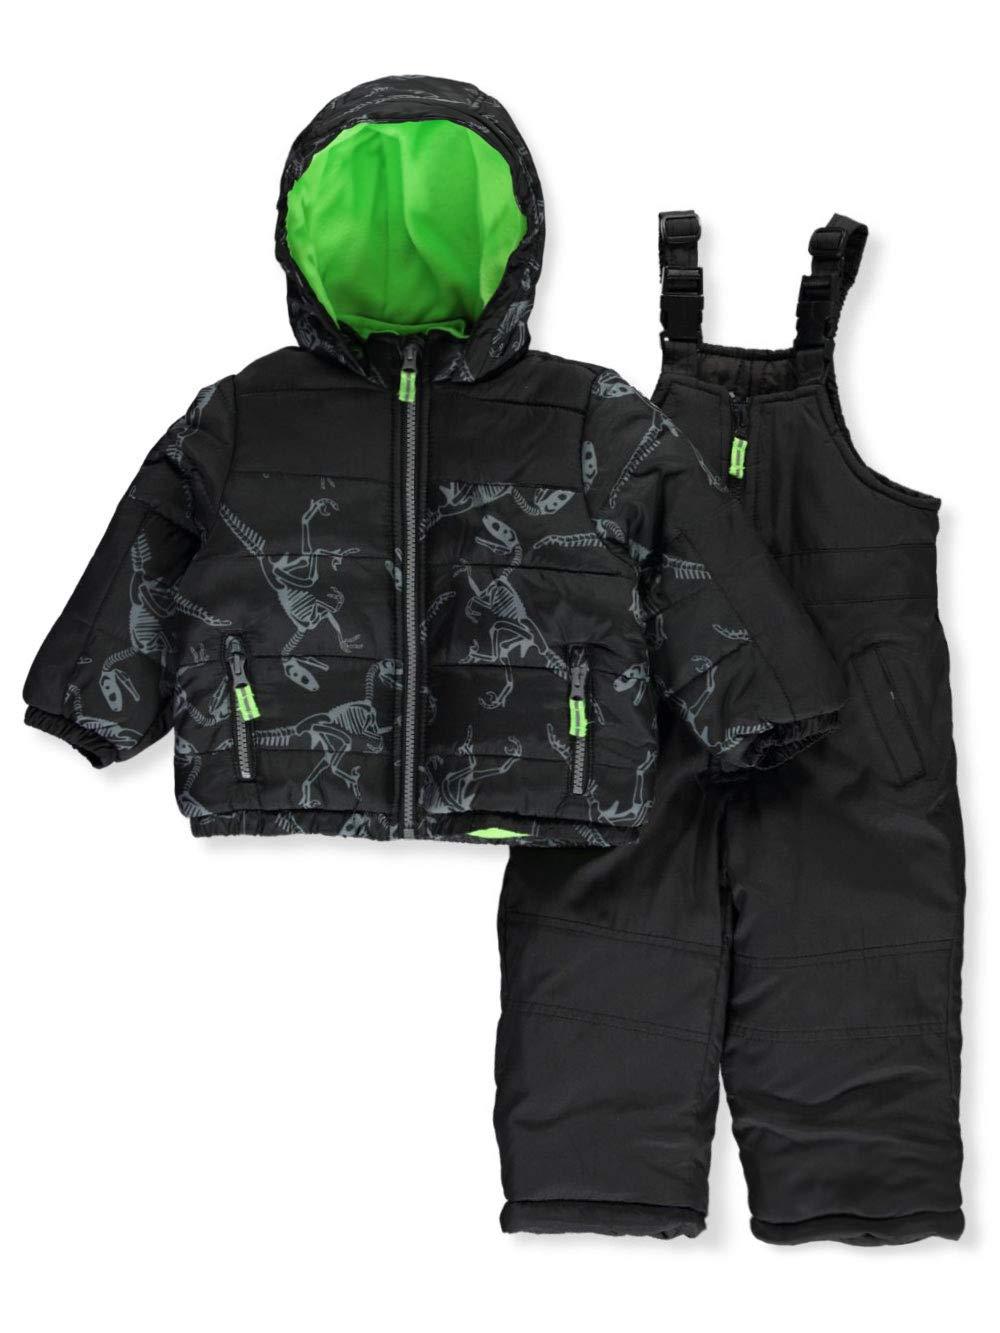 Osh Kosh Baby Boys Ski Jacket and Snowbib Snowsuit Set, Print Fall, 12Mo by OshKosh B'Gosh